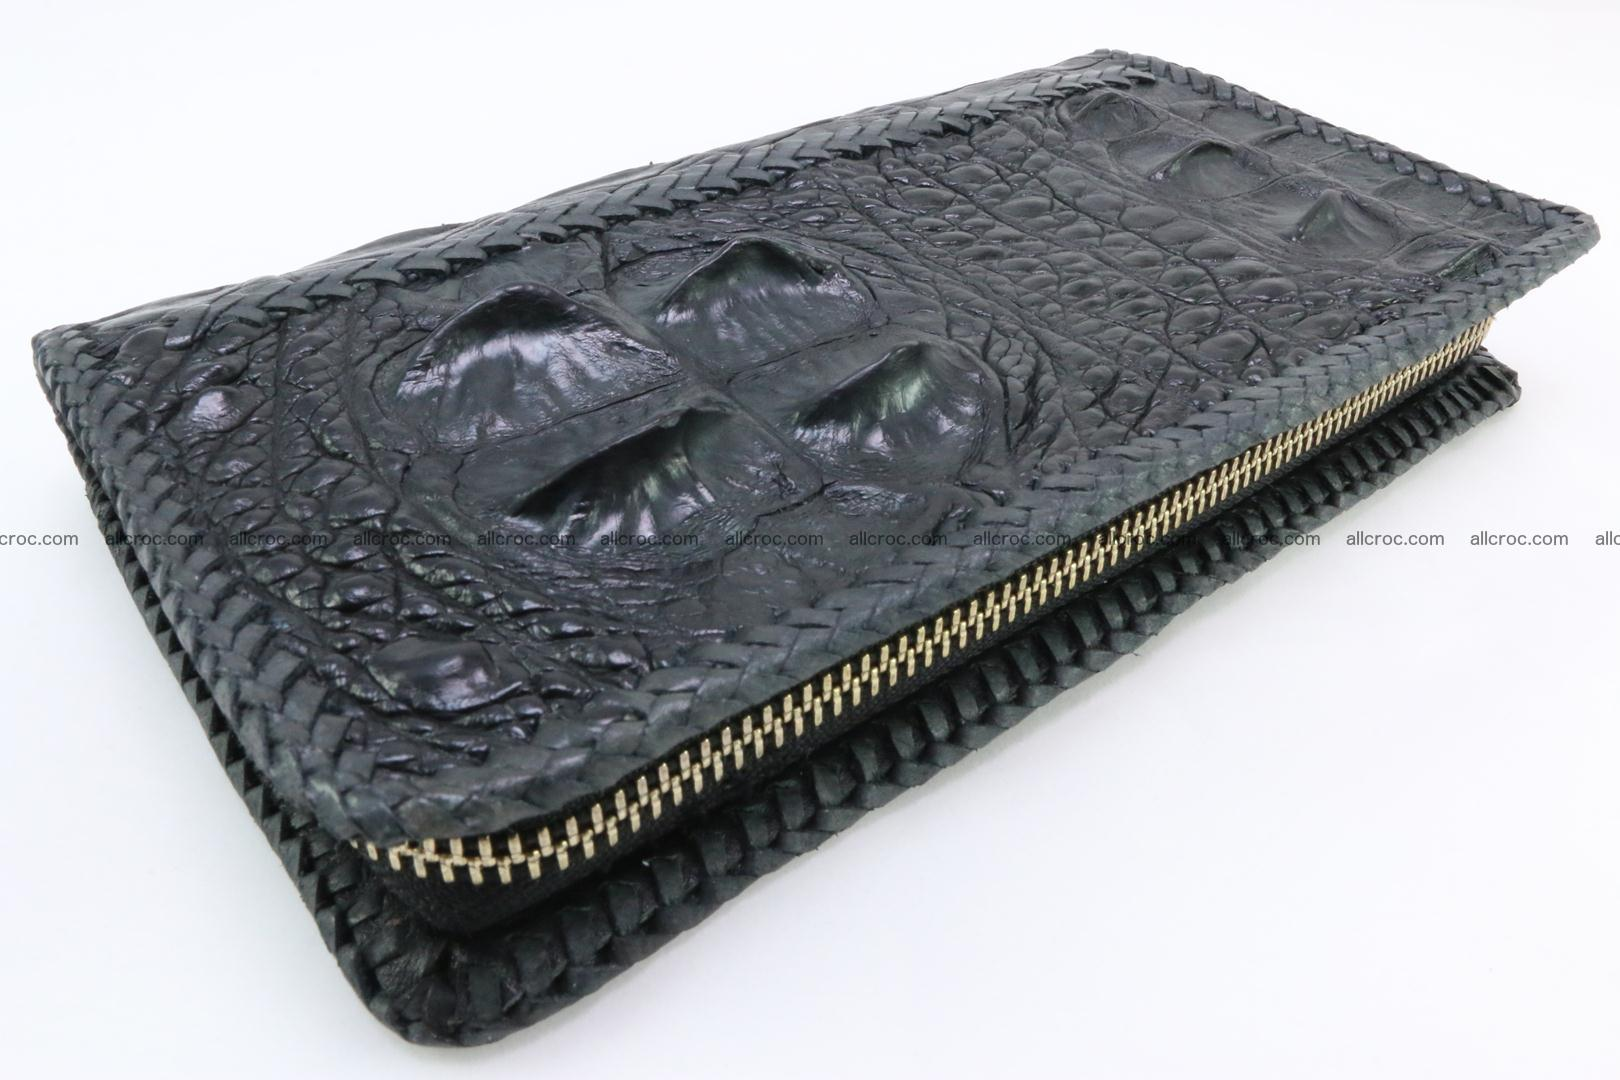 Genuine crocodile hornback wallet with zip 109 Foto 0